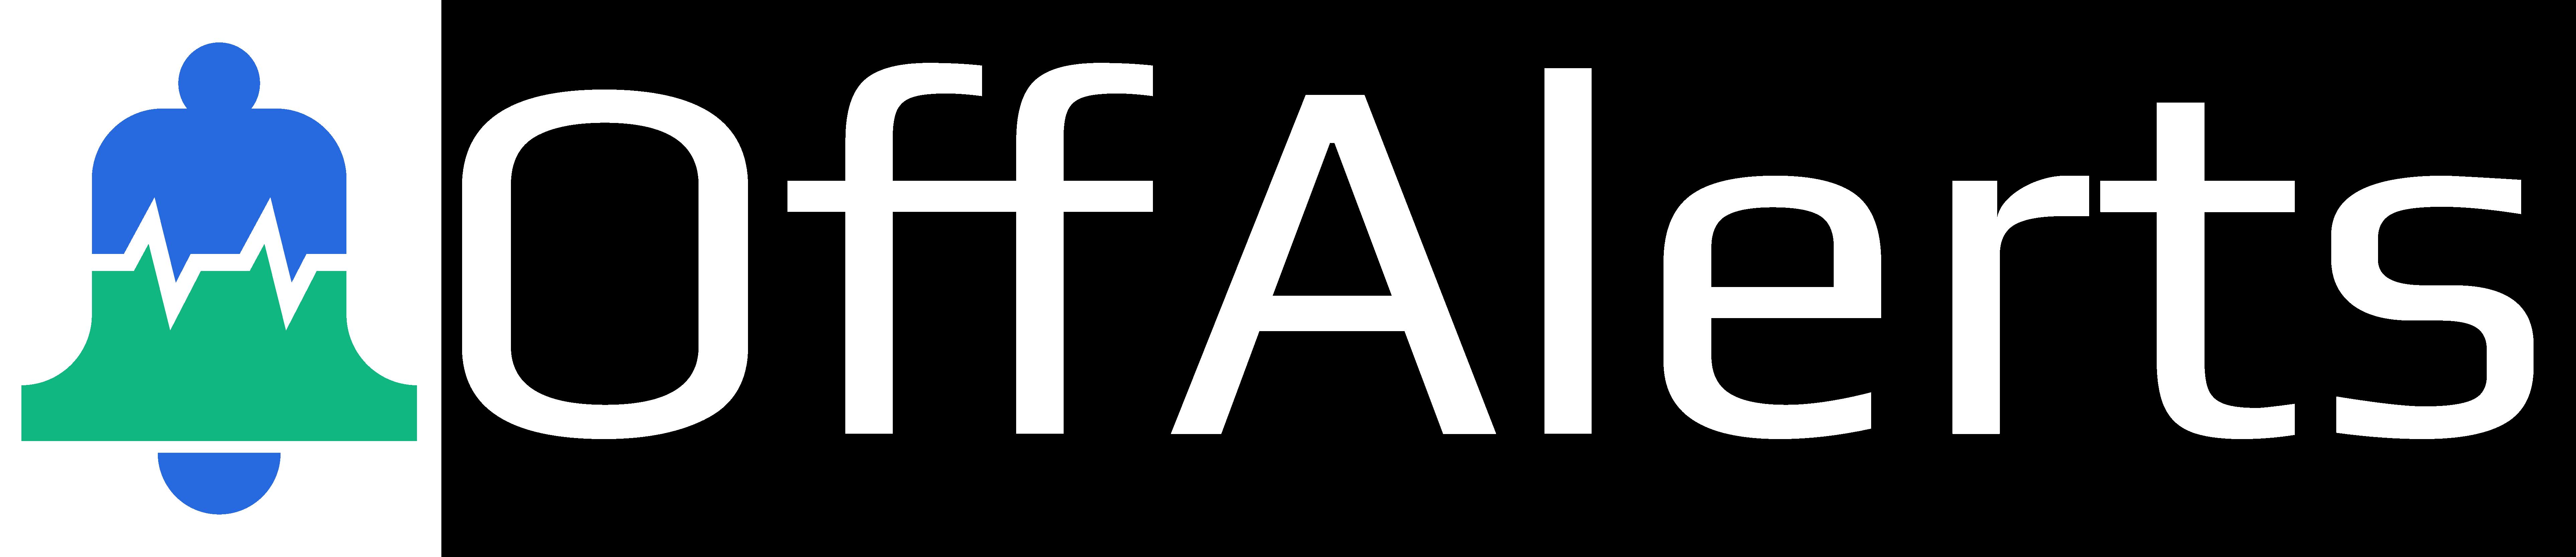 OffAlerts